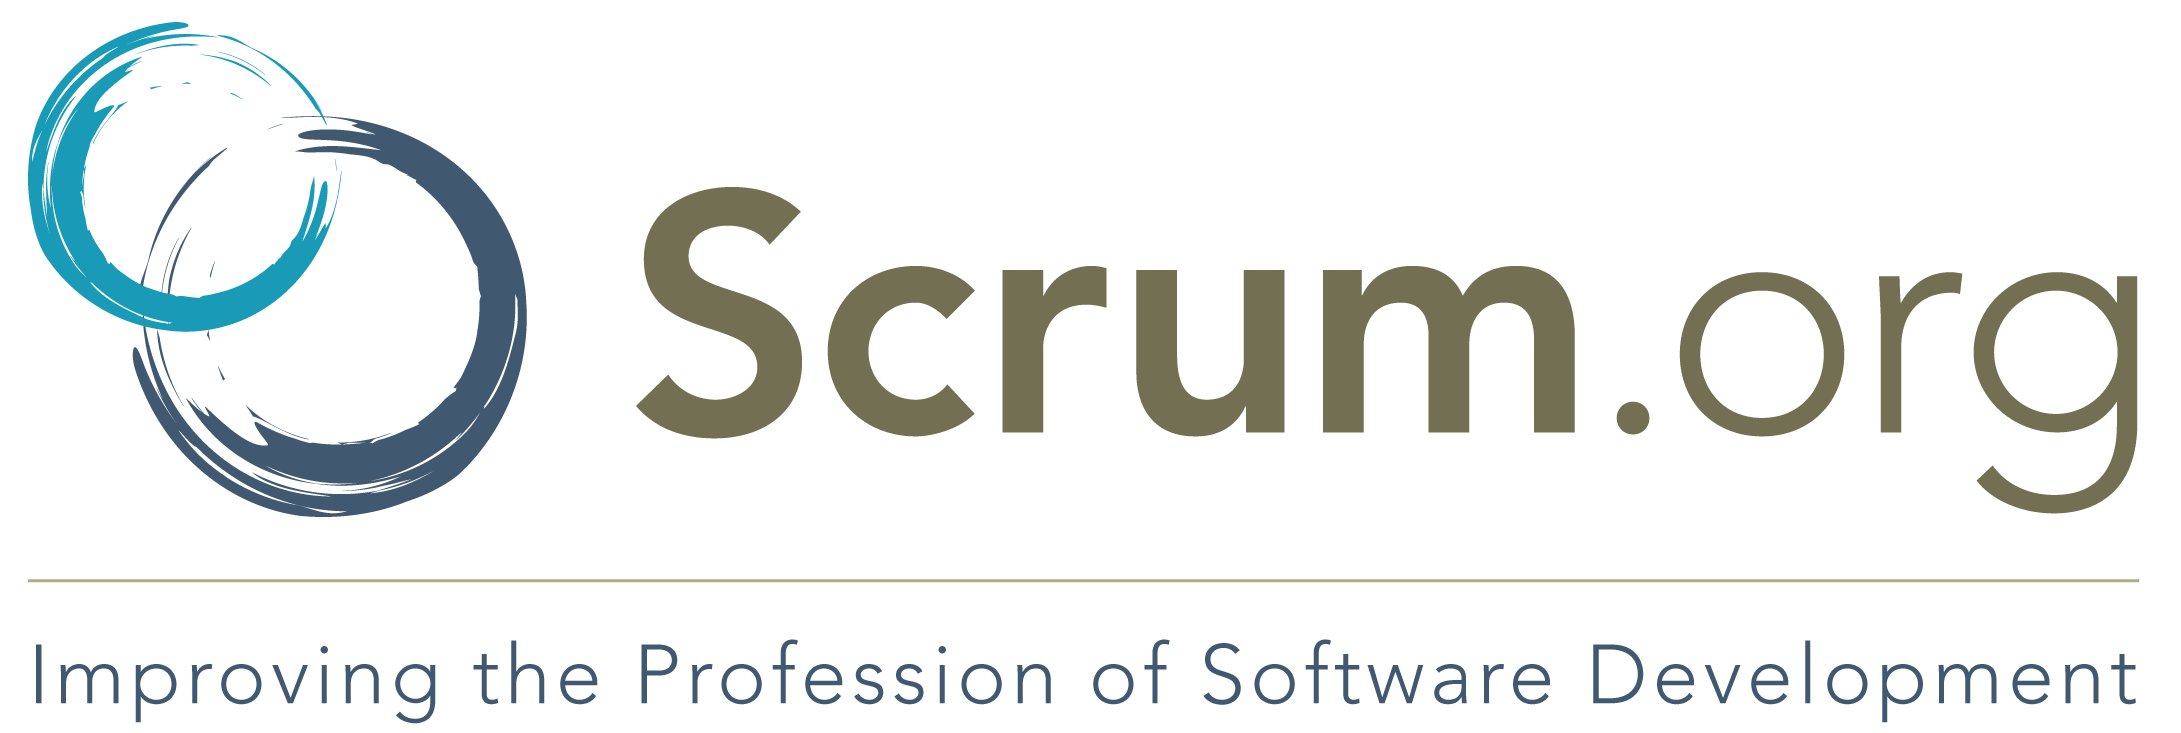 Scrum Logo Scrum.org Logo